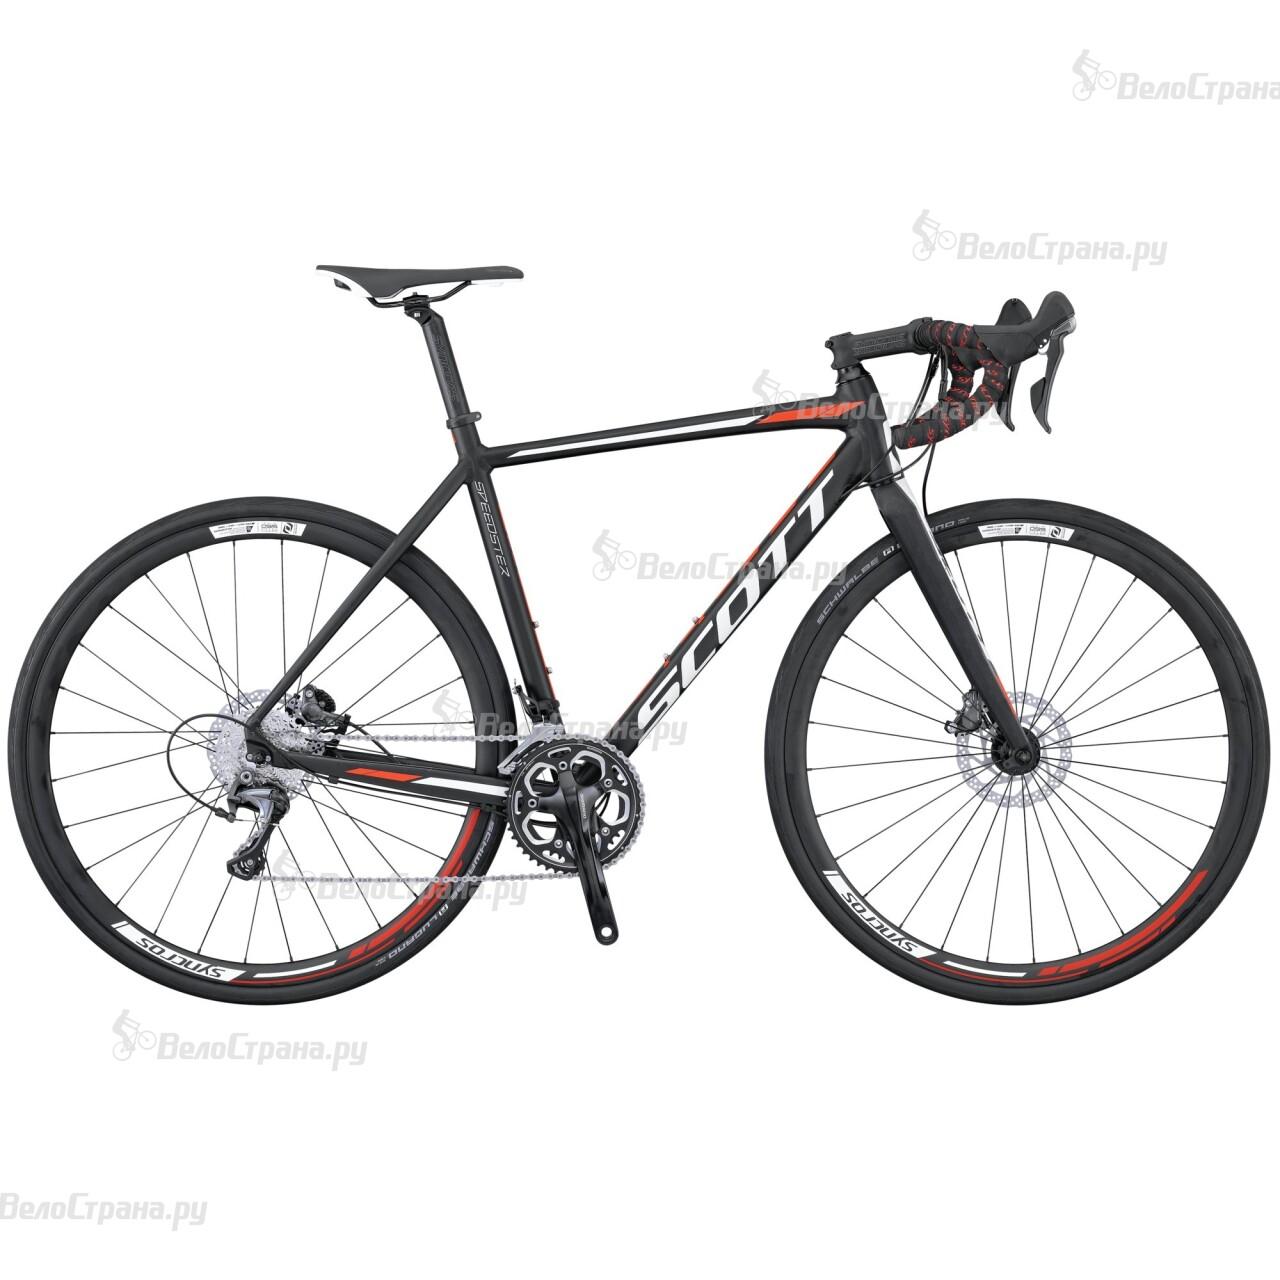 Велосипед Scott Speedster 20 Disc (2016) велосипед scott speedster cx 20 disc 28 2016